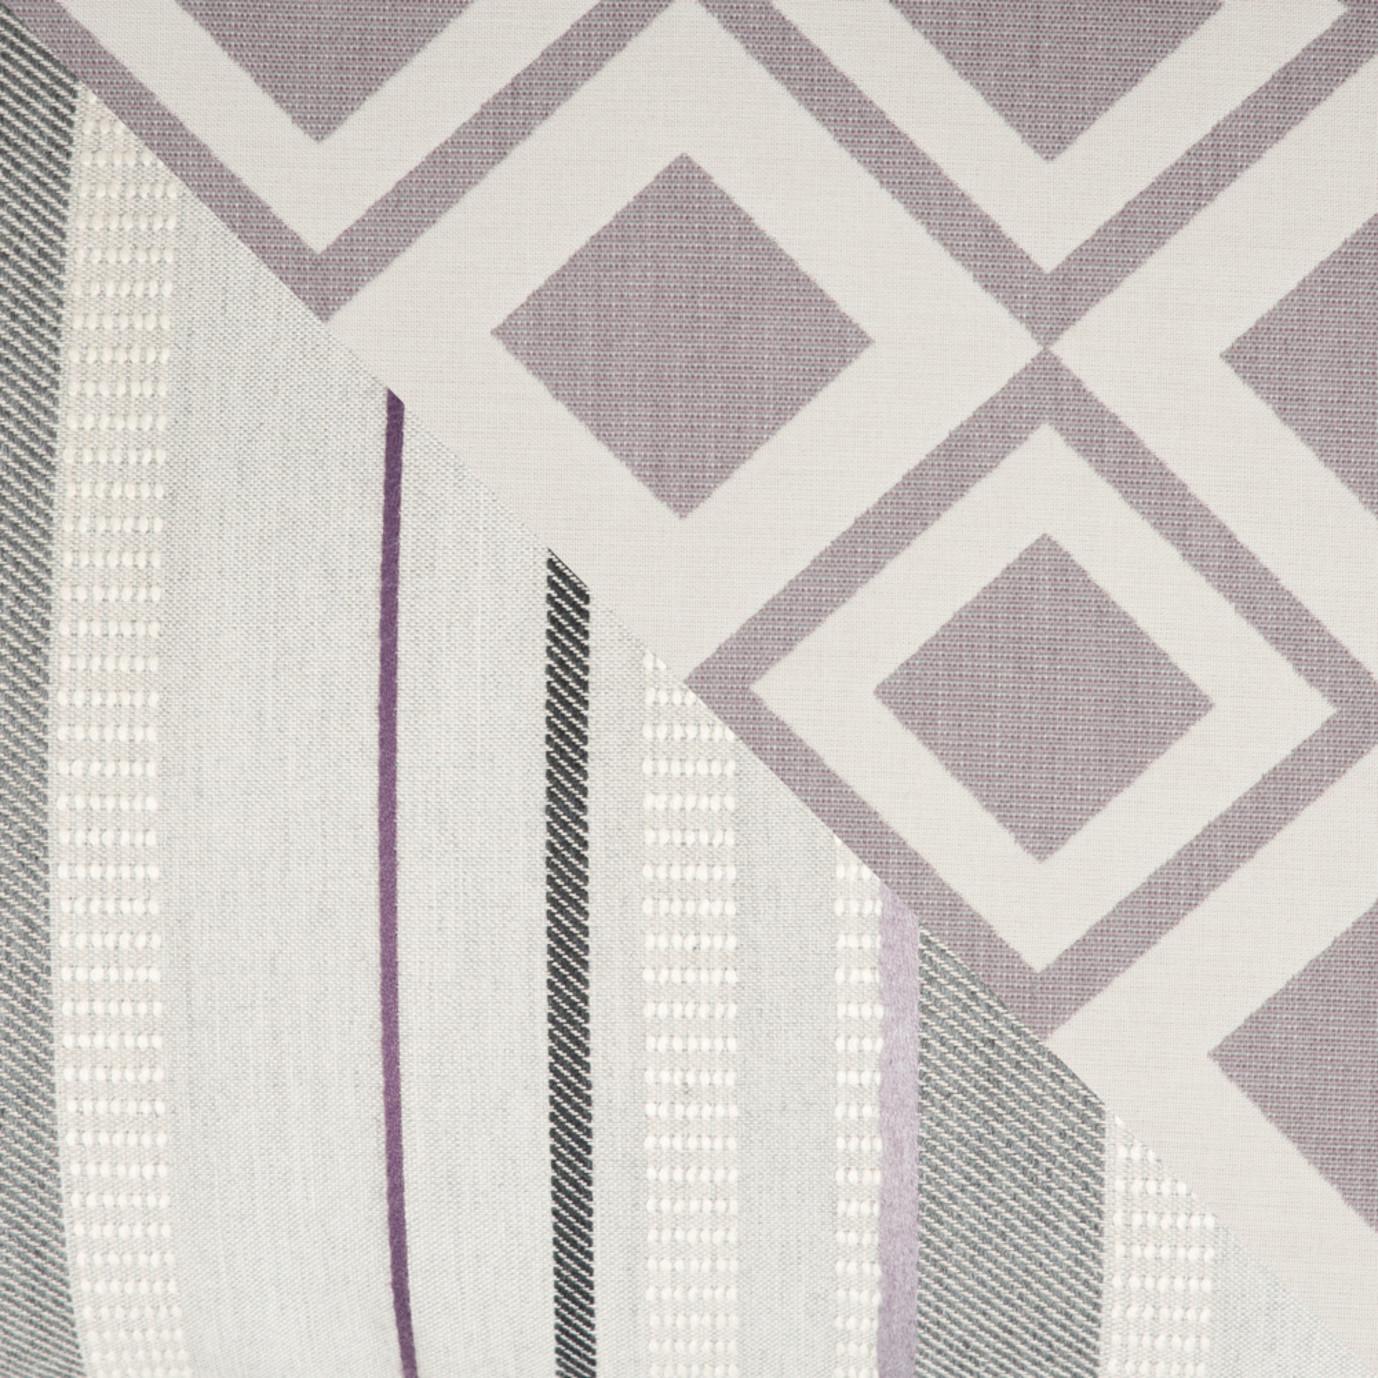 Deco™ Club Chairs - Wisteria Lavender